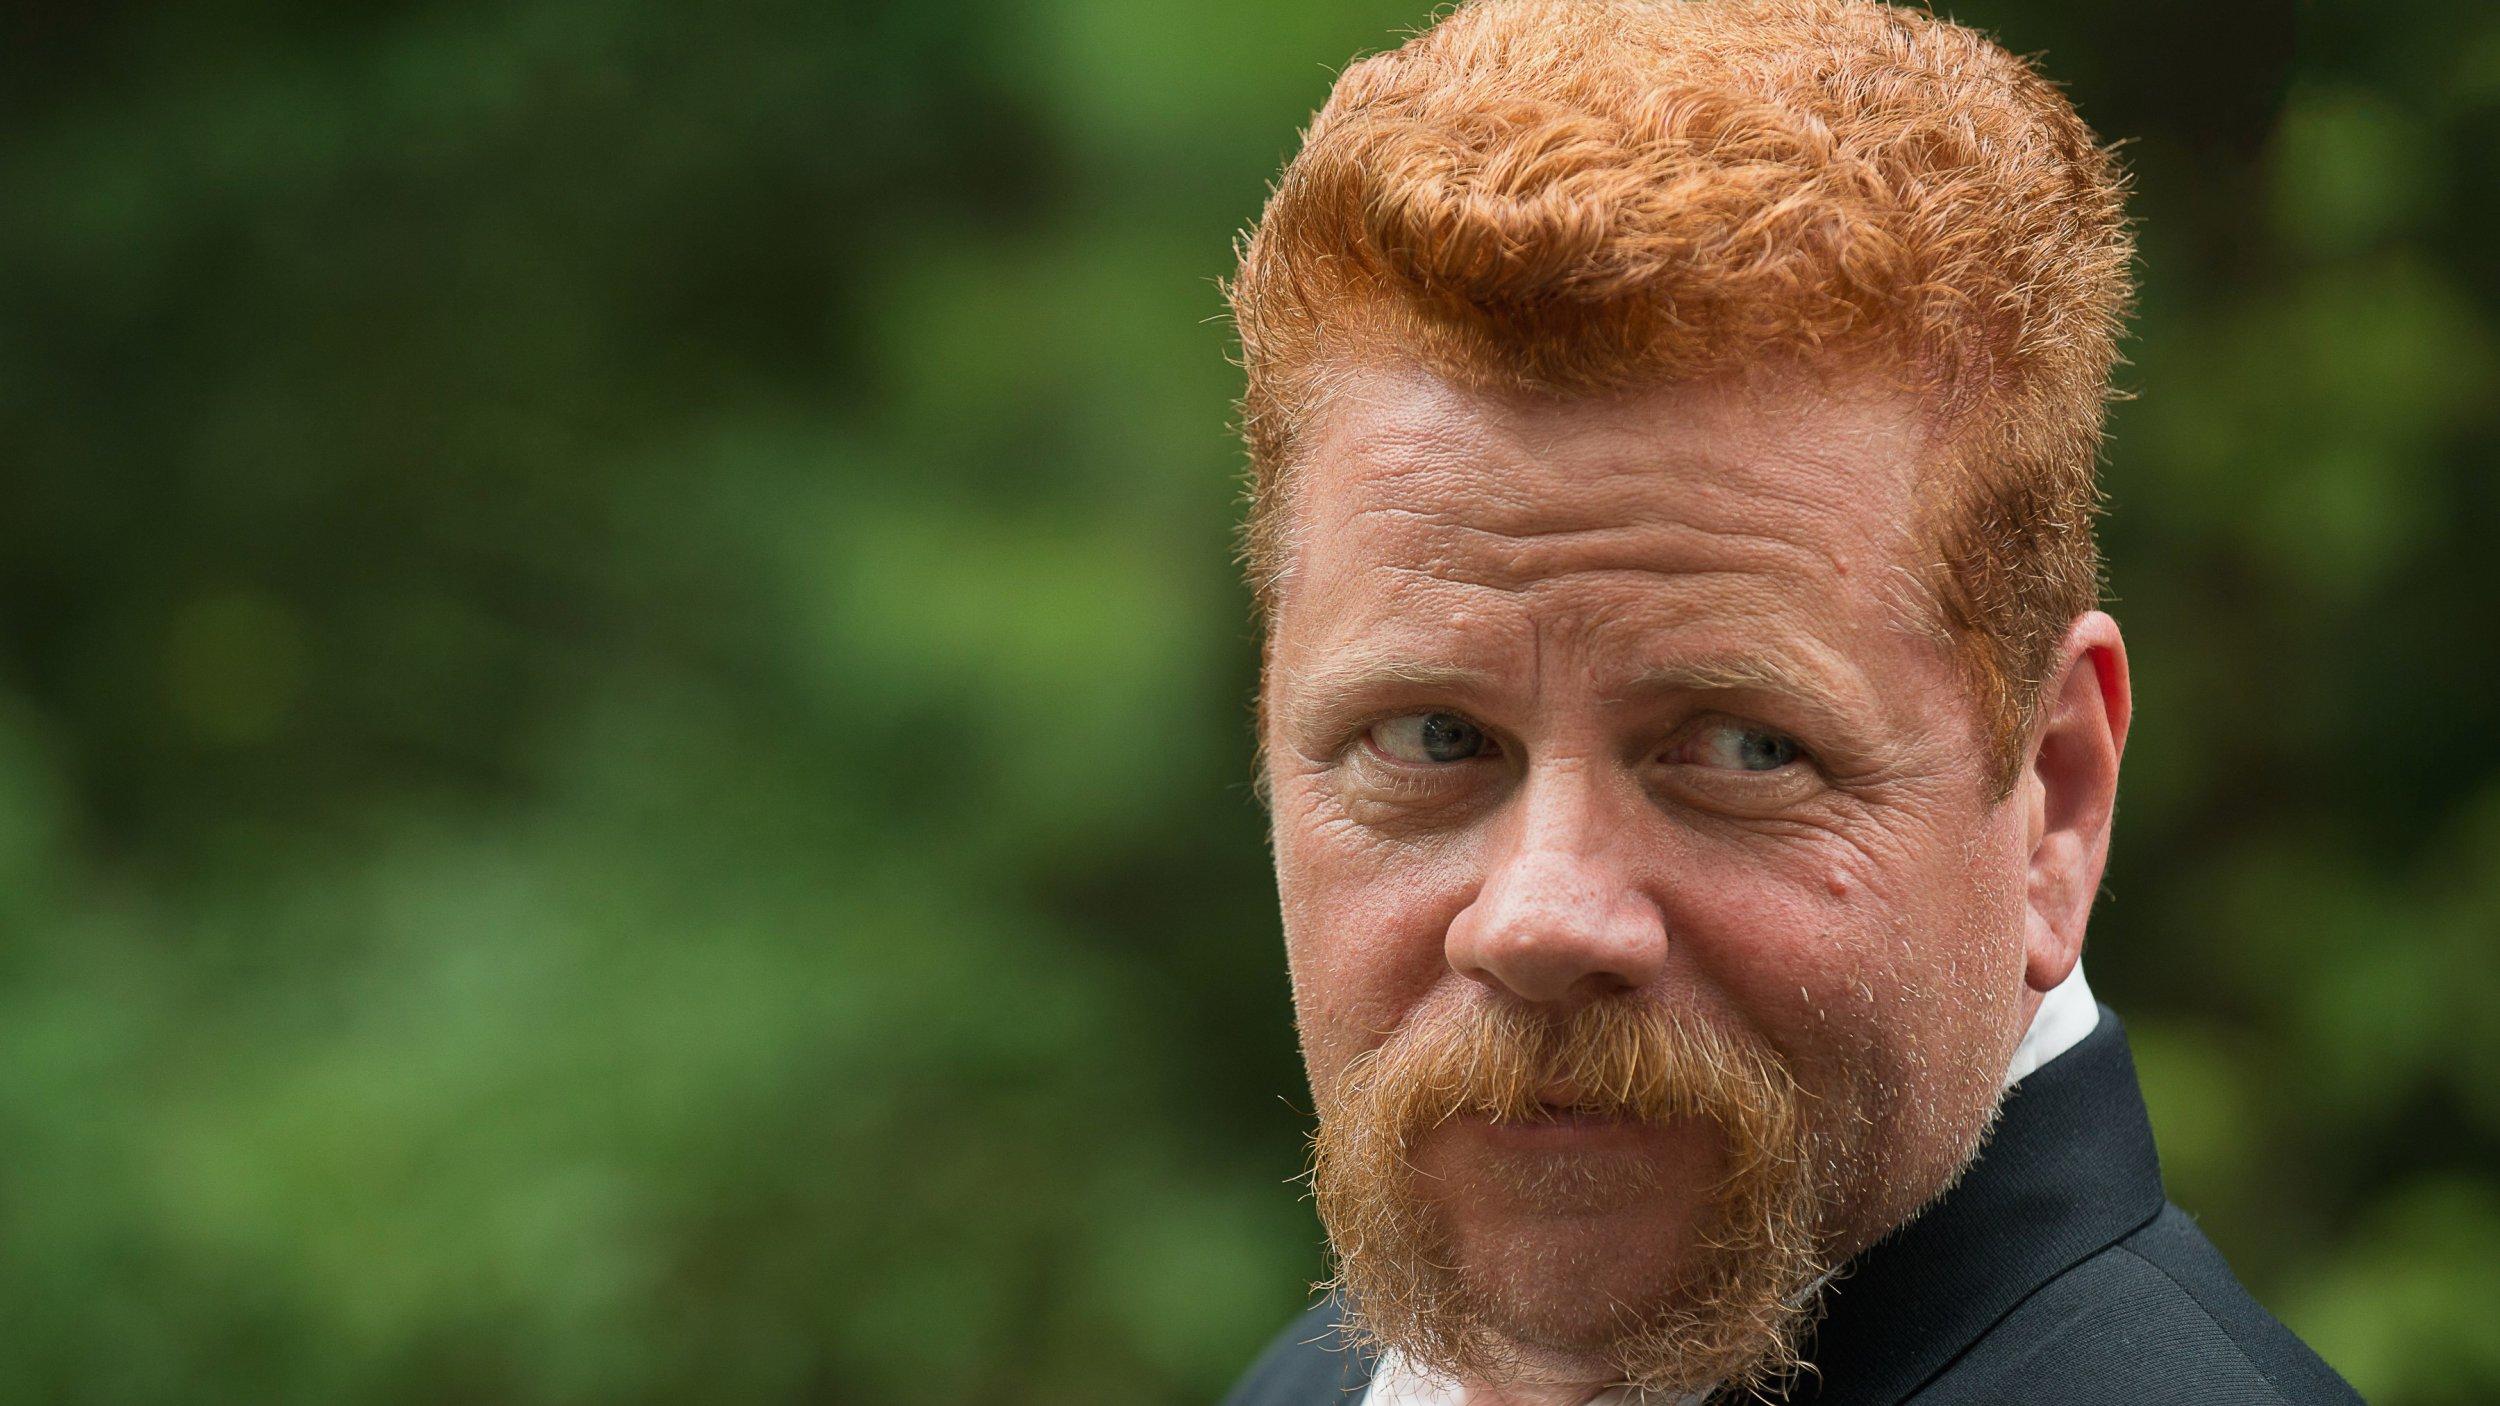 Michael Cudlitz as Abraham in The Walking Dead S6E09 Credit: AMC